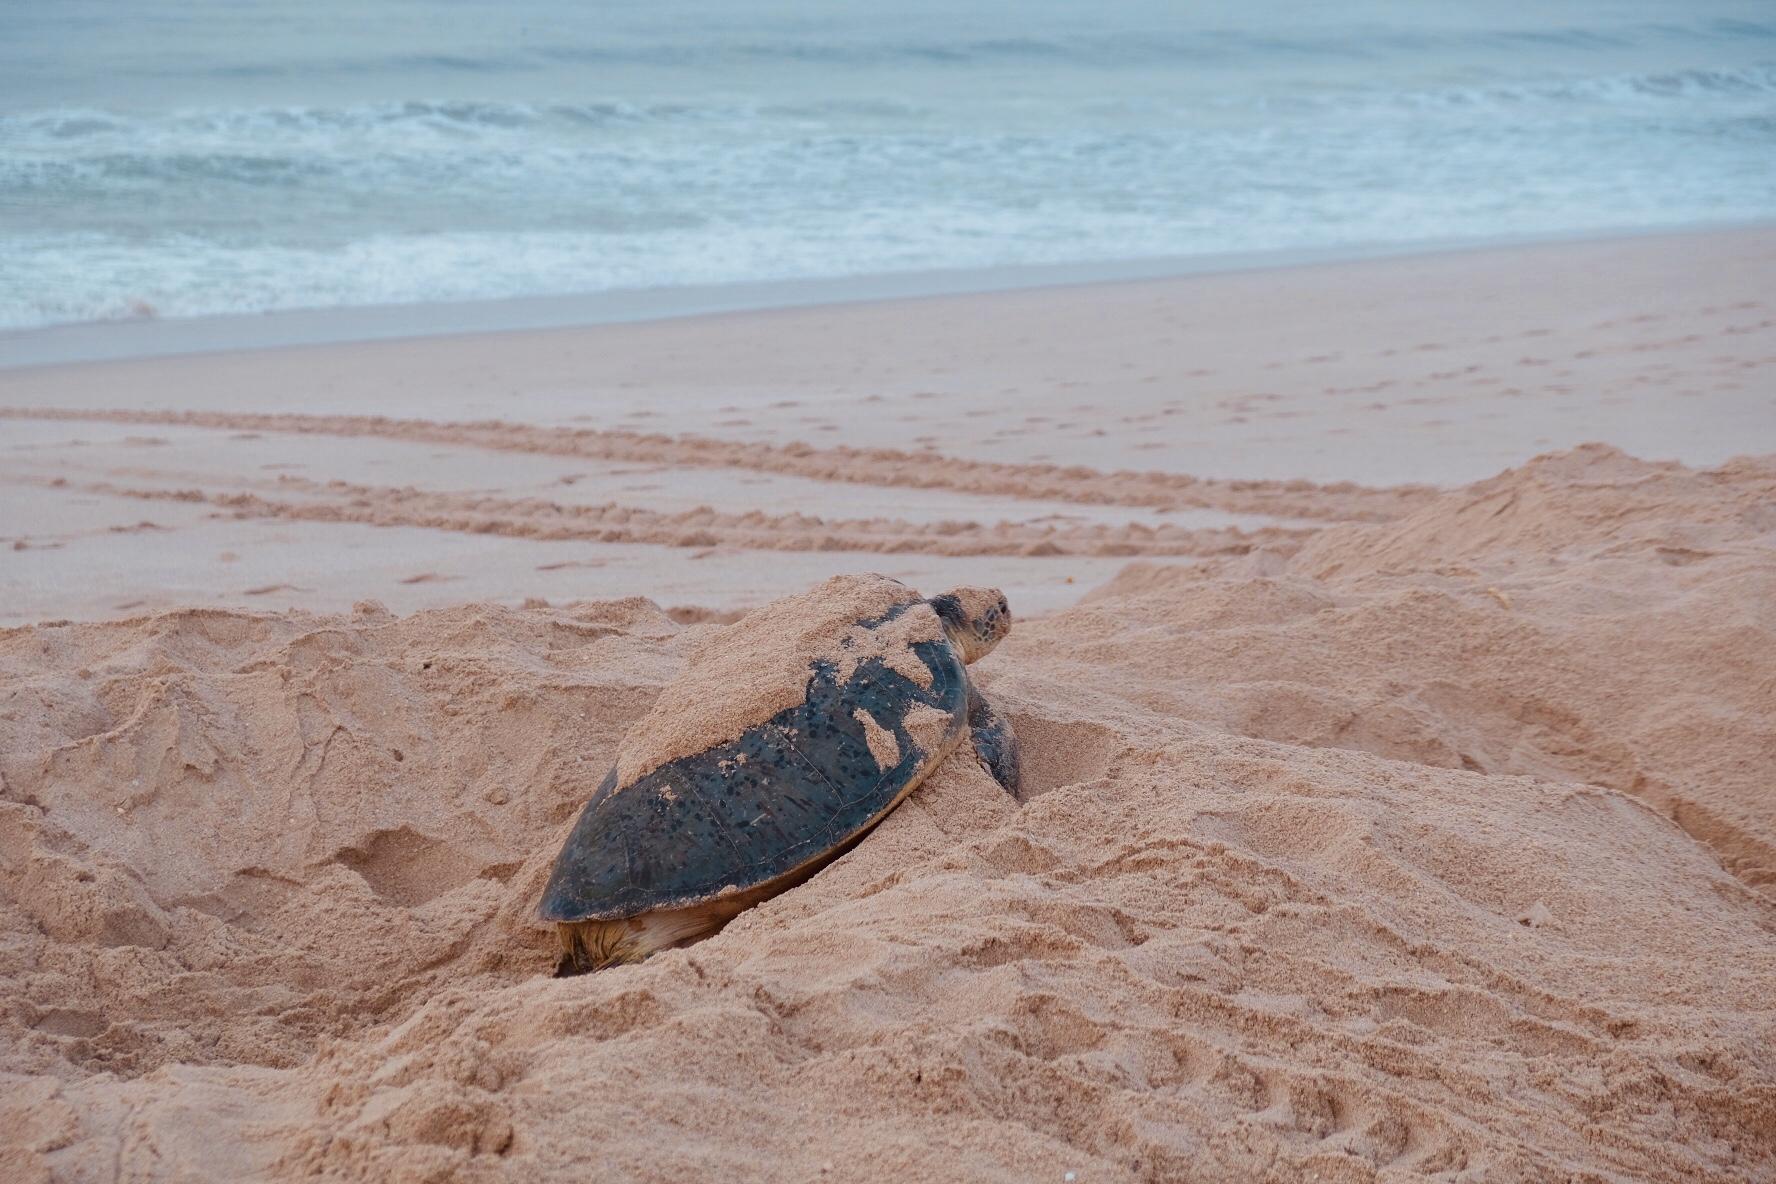 TurtleReserve